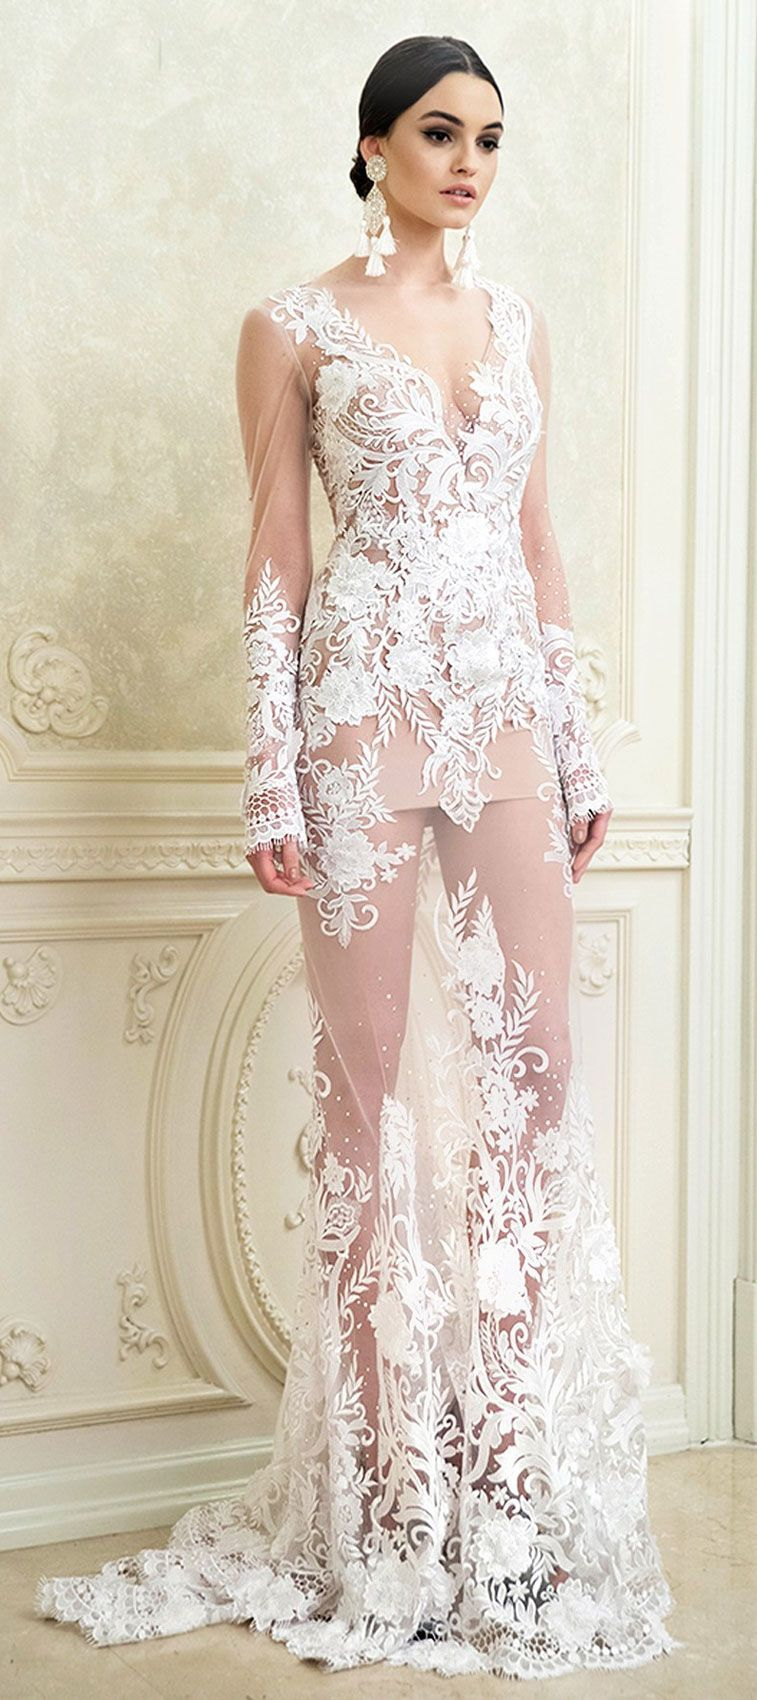 Tulle mermaid wedding dress  Wedding Dress Inspiration  Mermaid wedding dresses Wedding dress